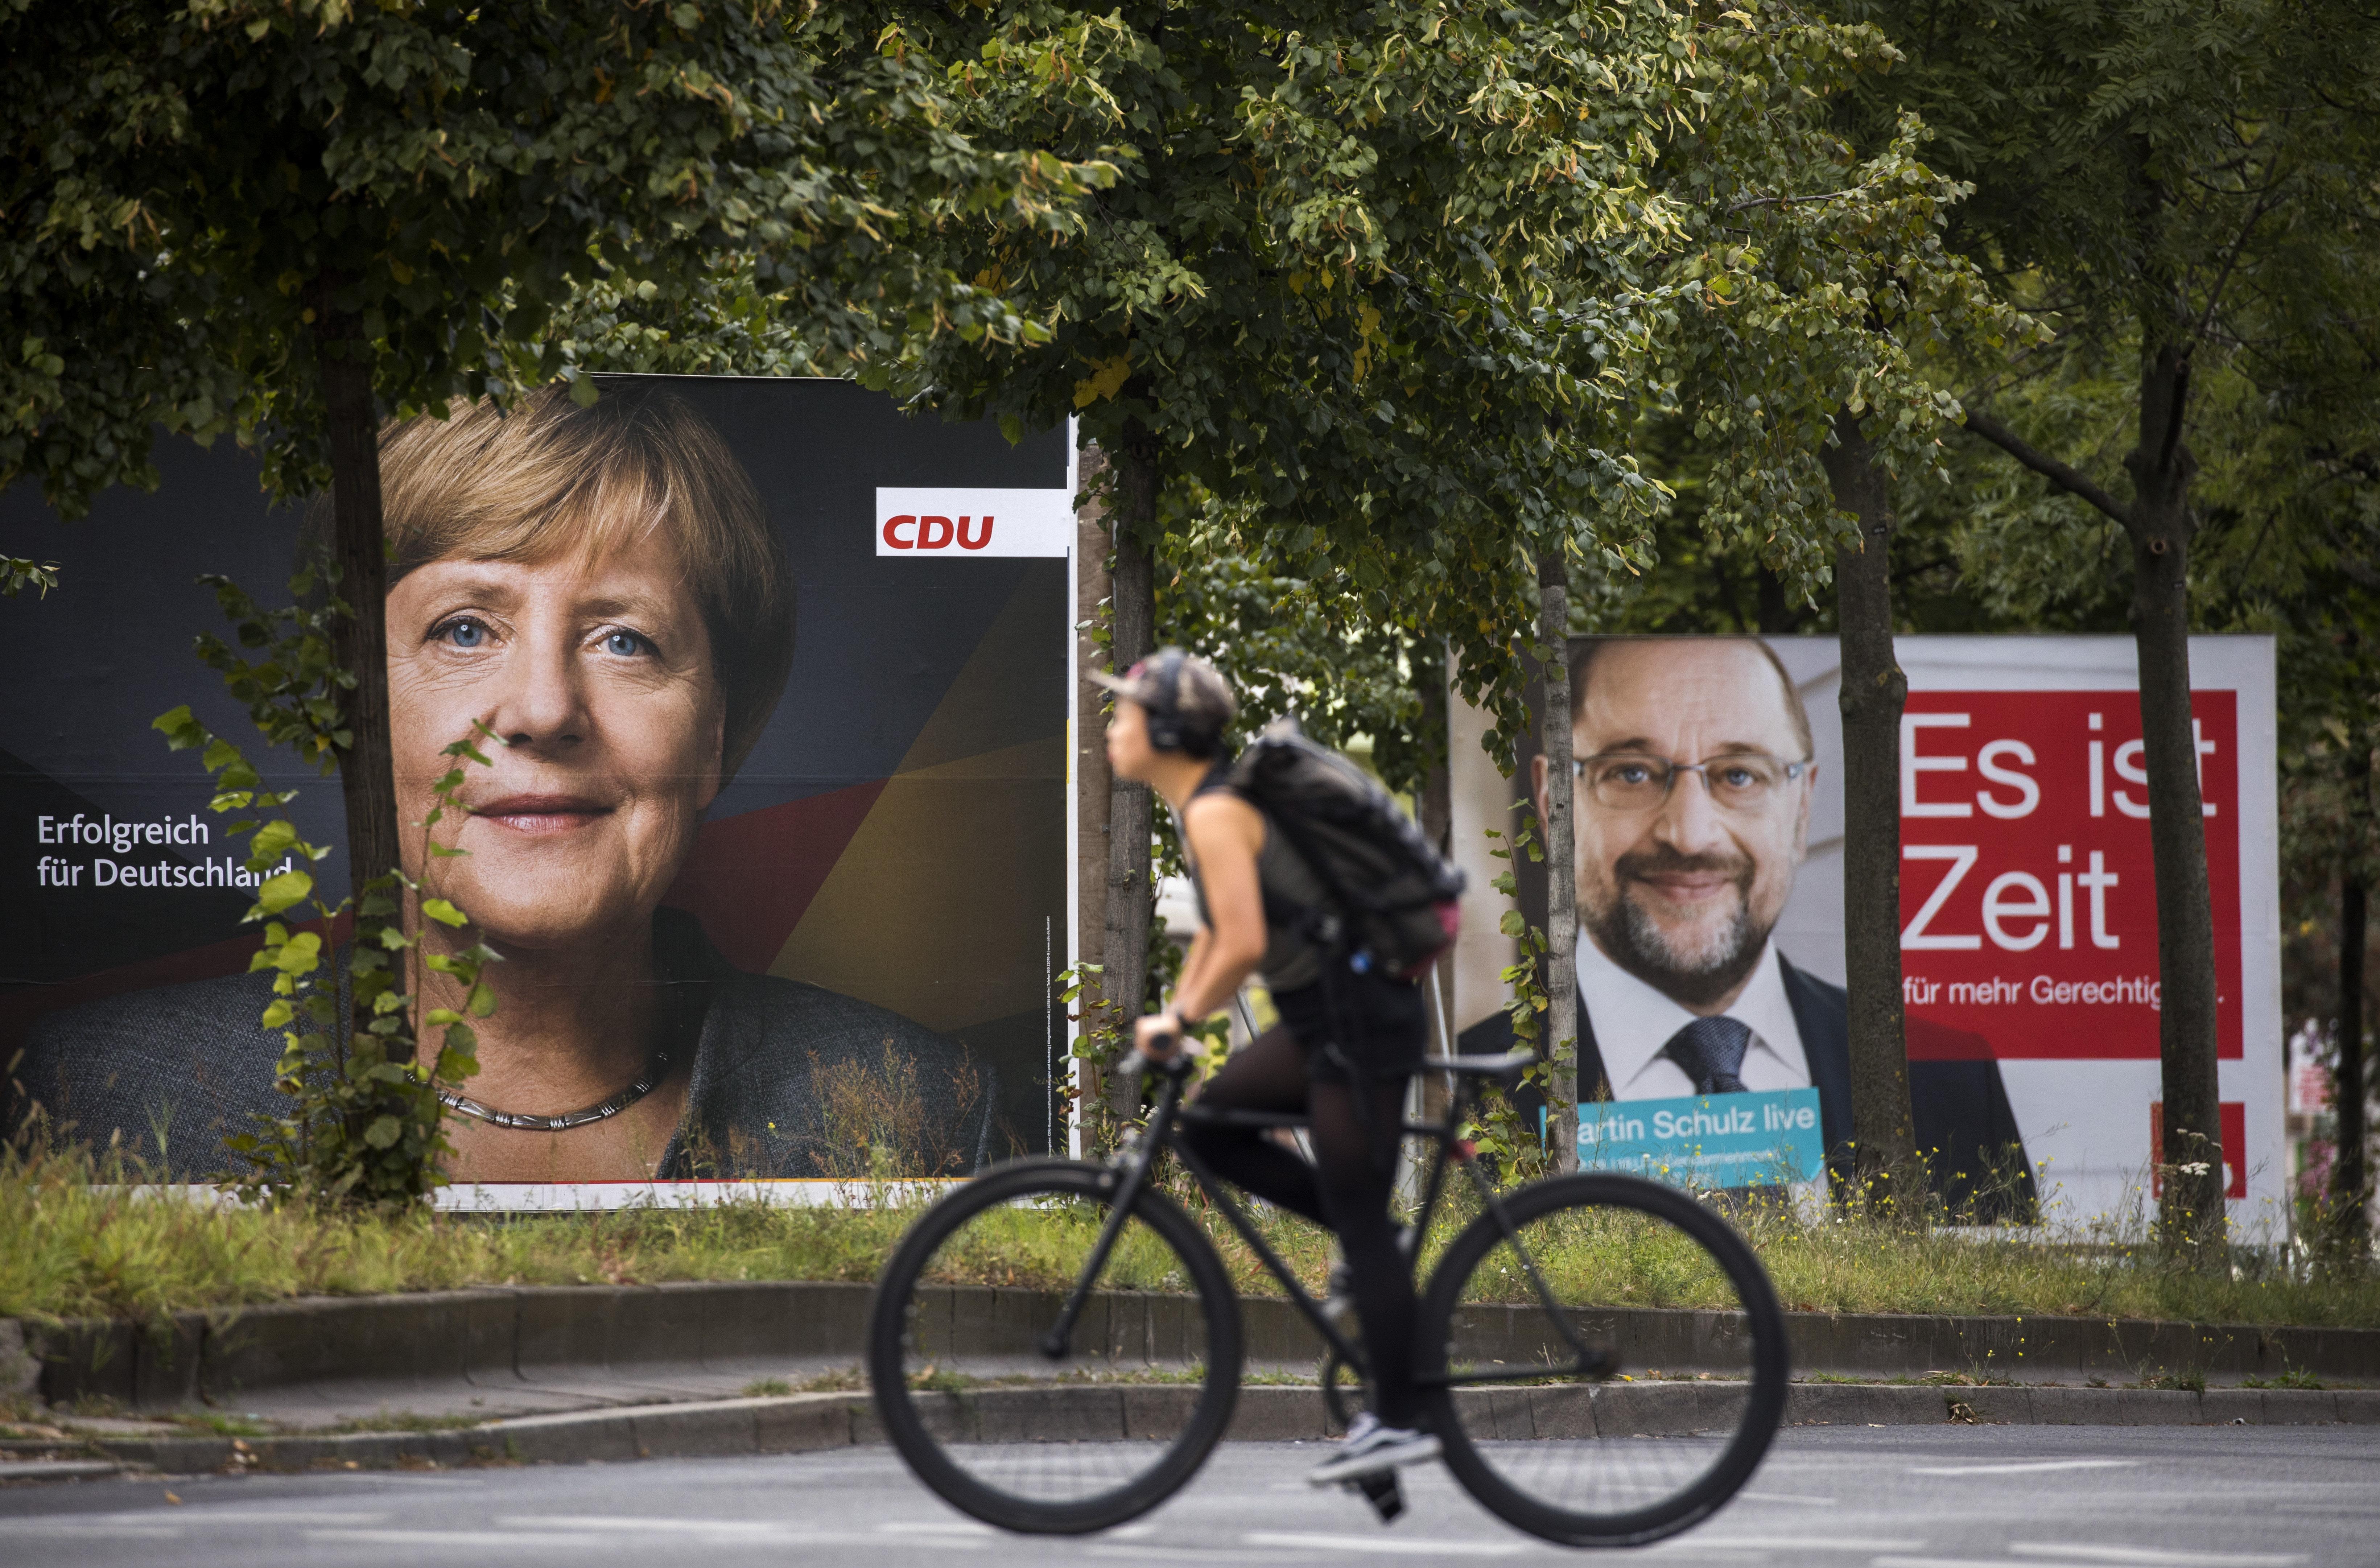 Germania: Frauke Petry lascia l'Afd